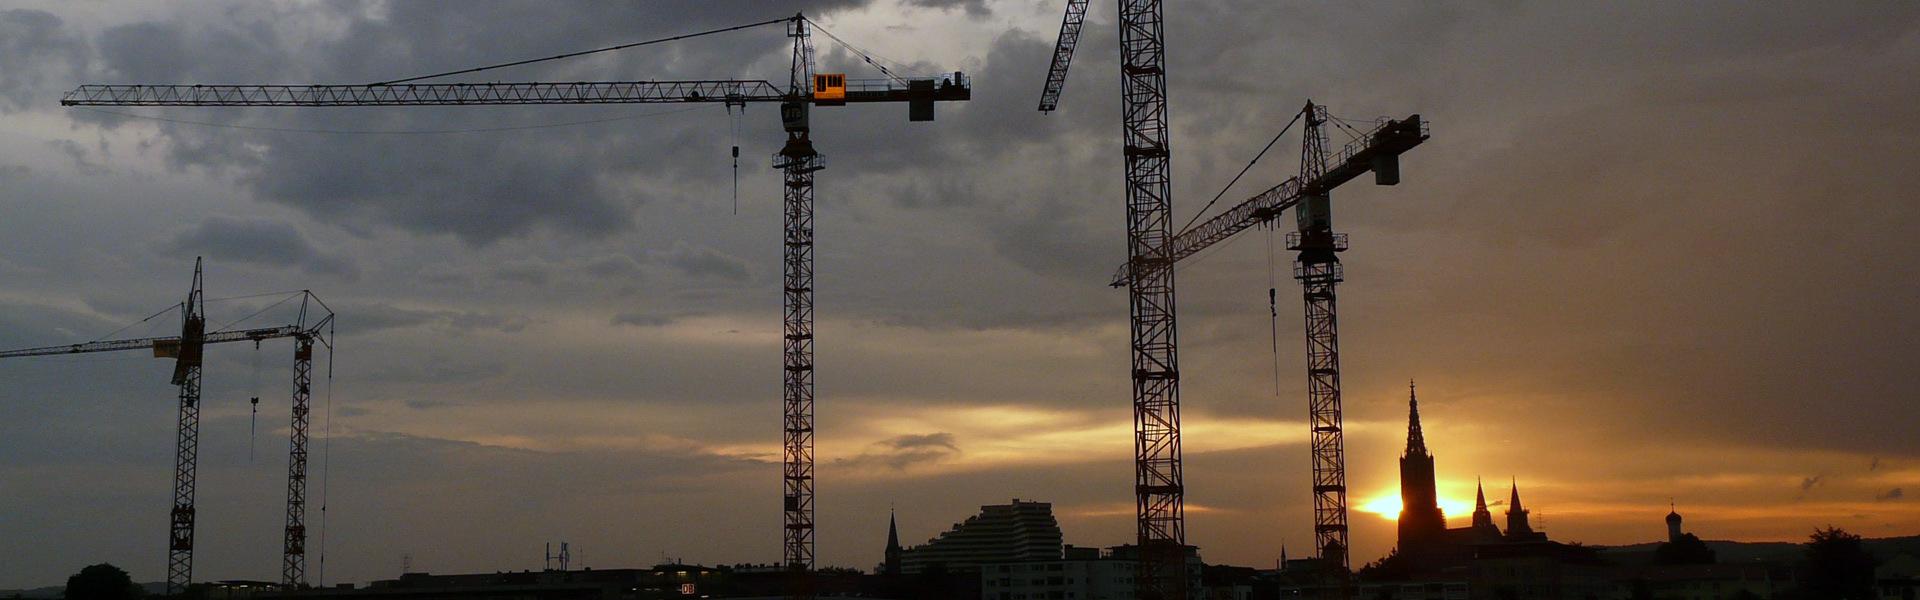 SKIBINSKI BUILDING STRUCTURES